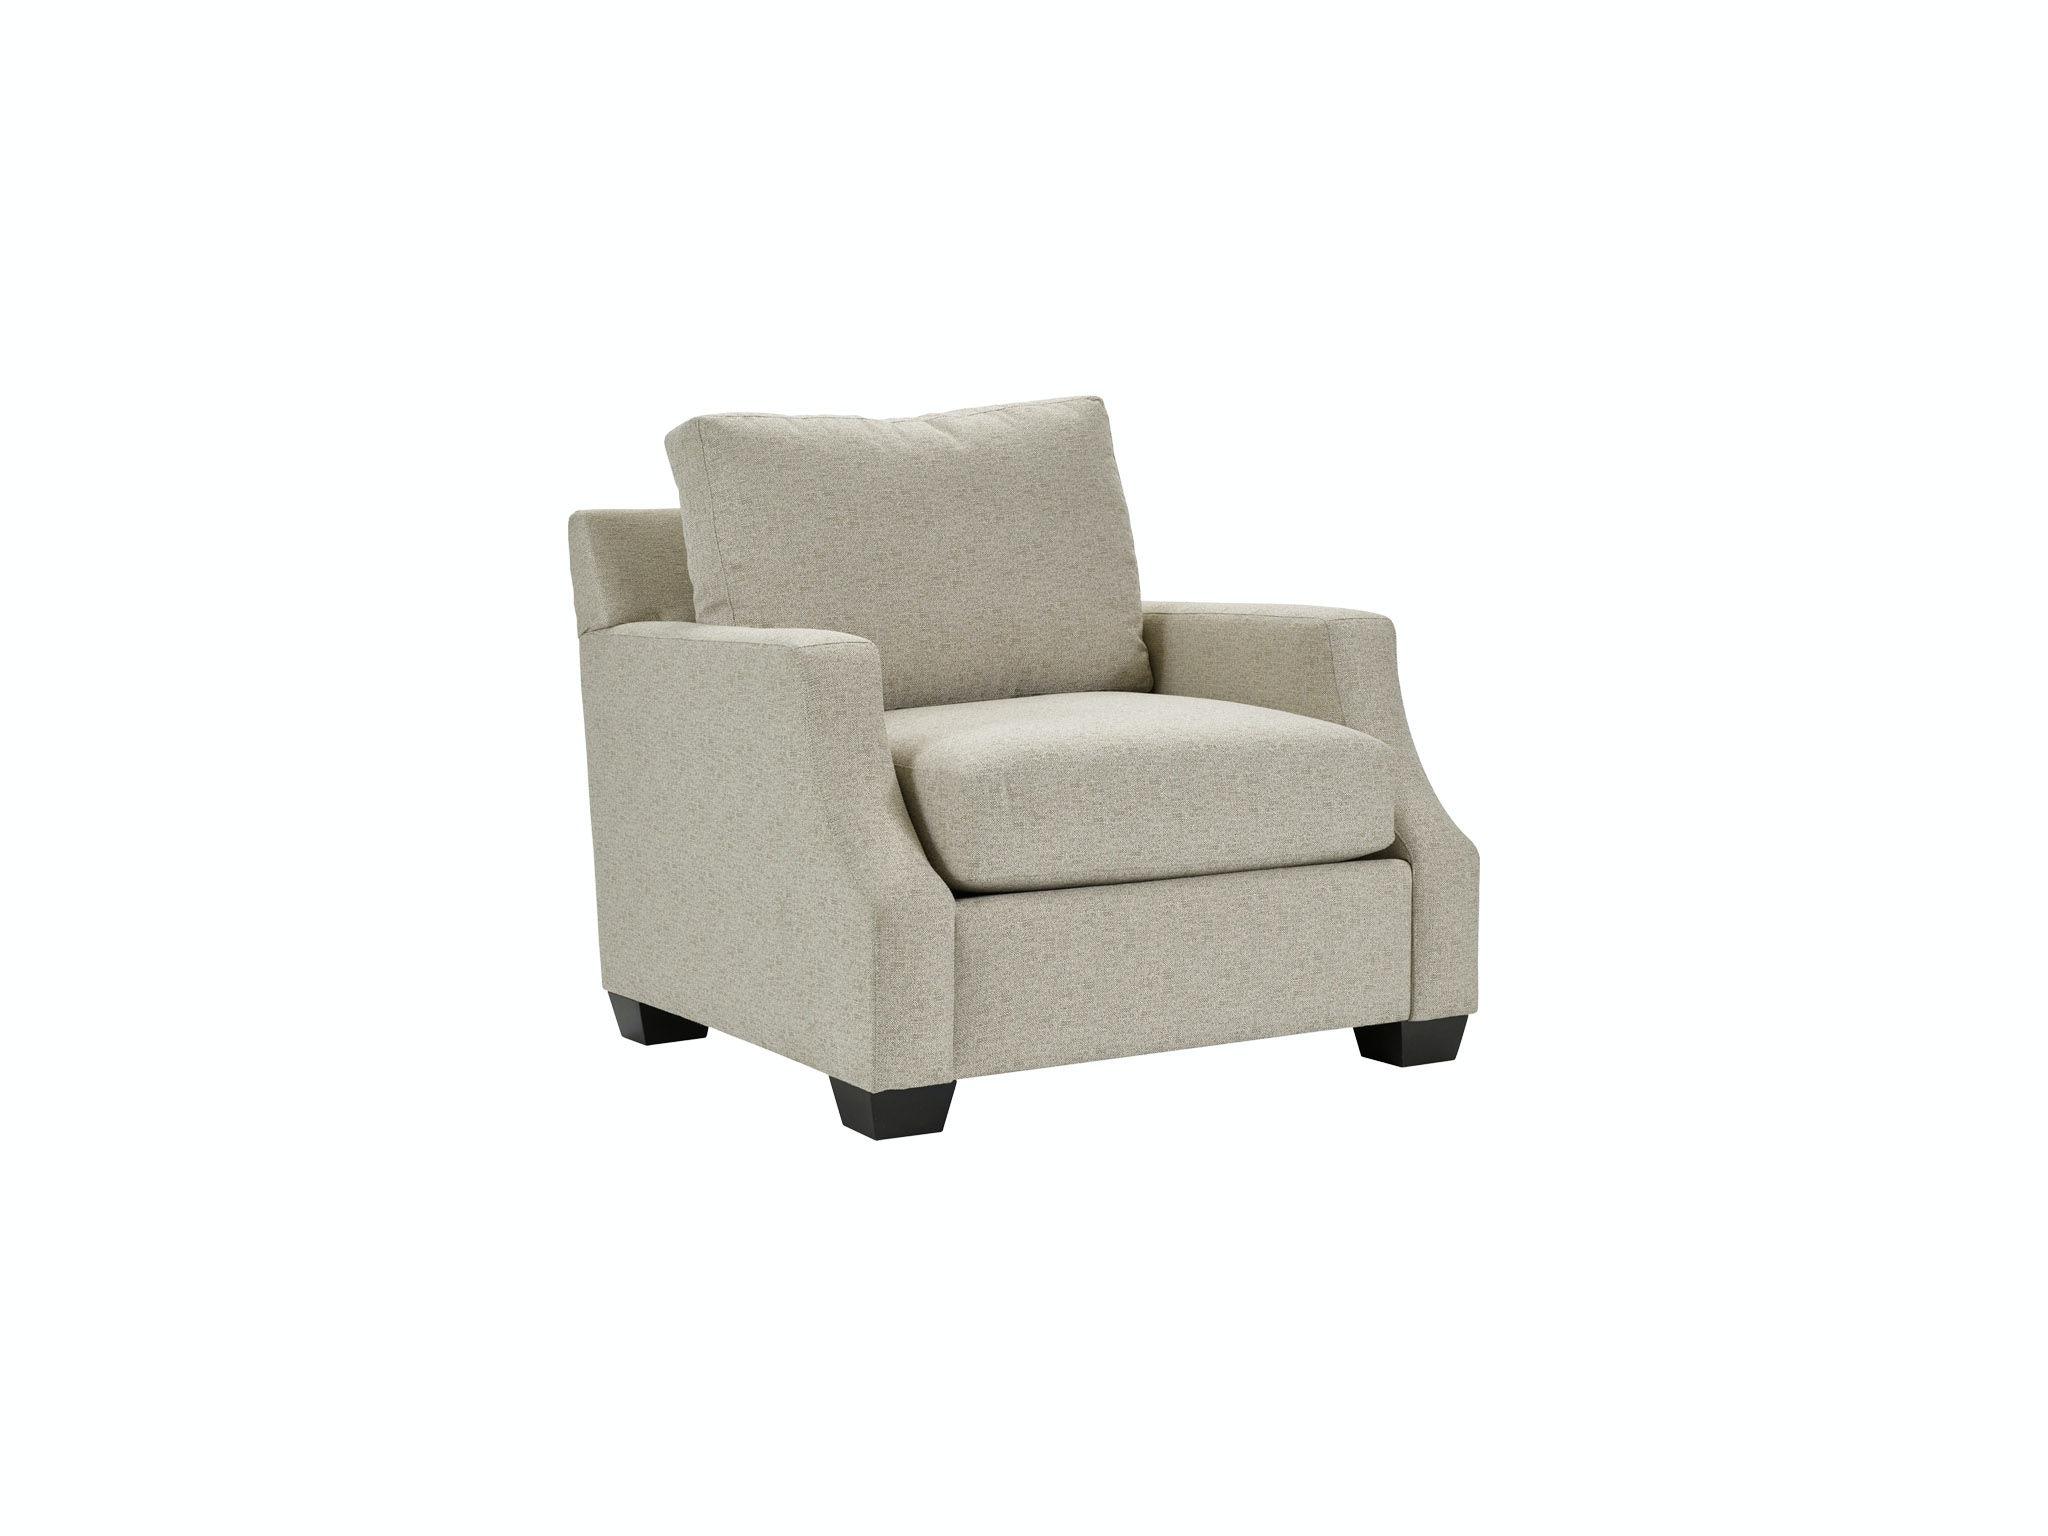 Broyhill Chambers Chair 4212 000